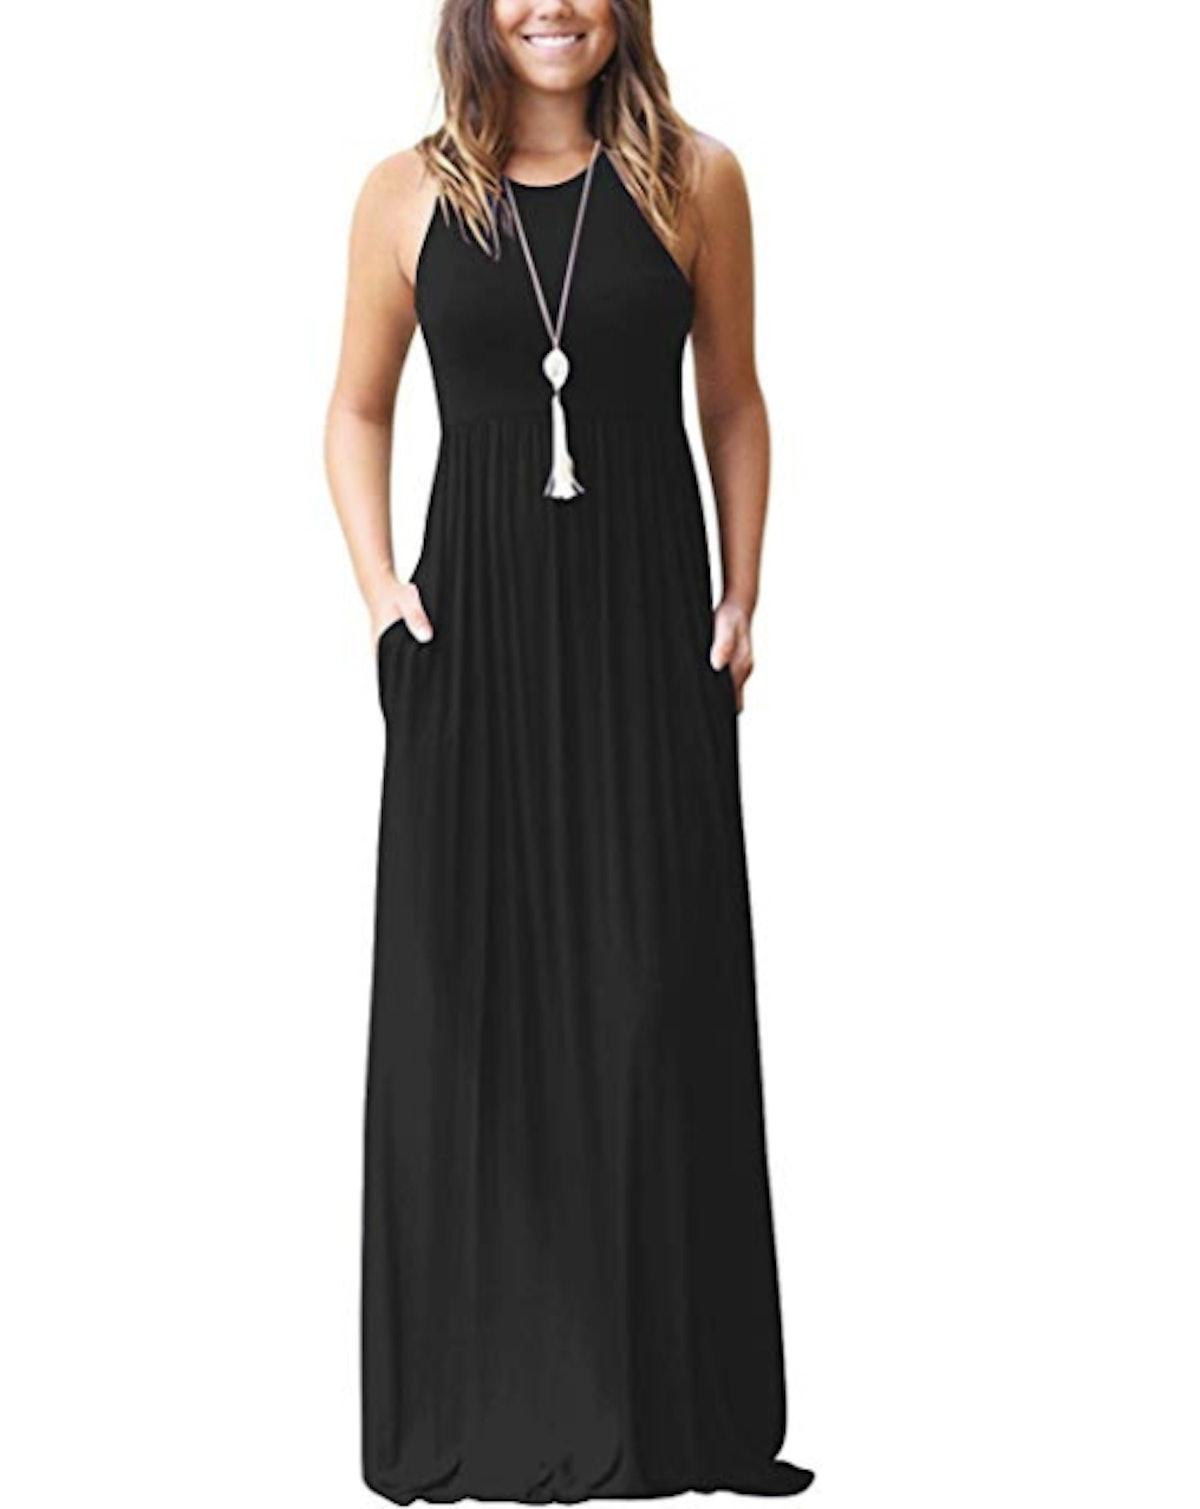 GRECERELLE Women's Sleeveless Racerback Dress